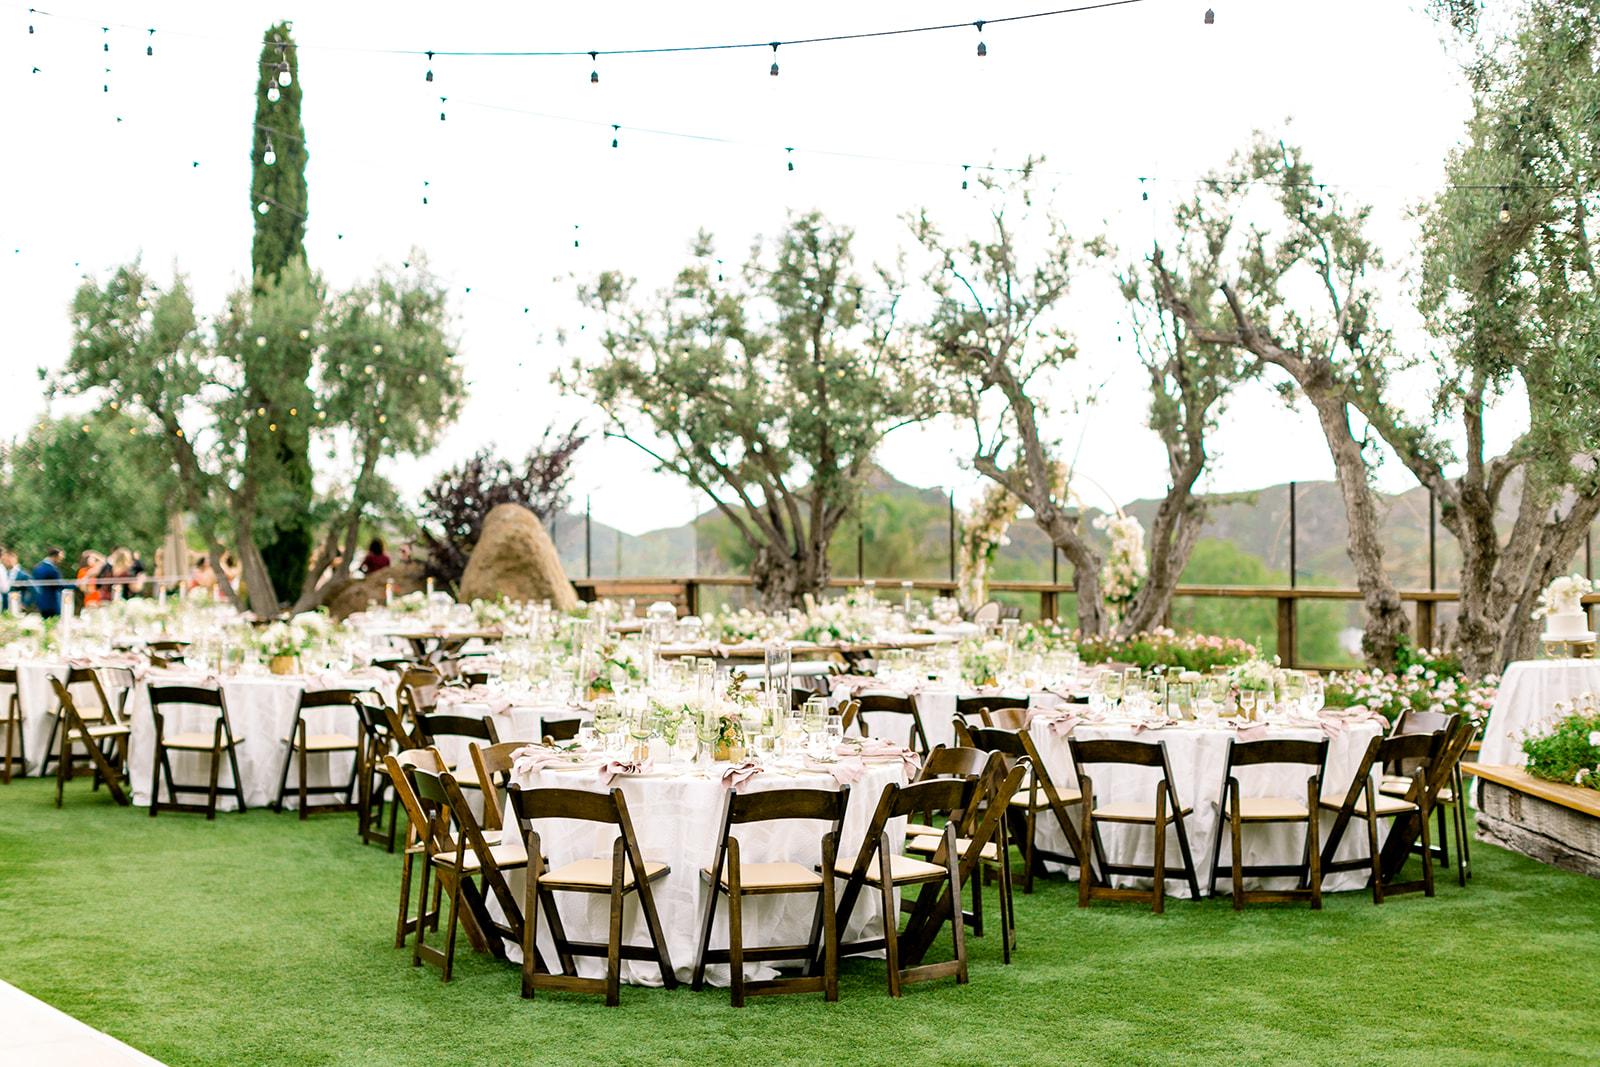 Ben & Emma's Wedding - Natalie Schutt Photography - Details-54.jpg